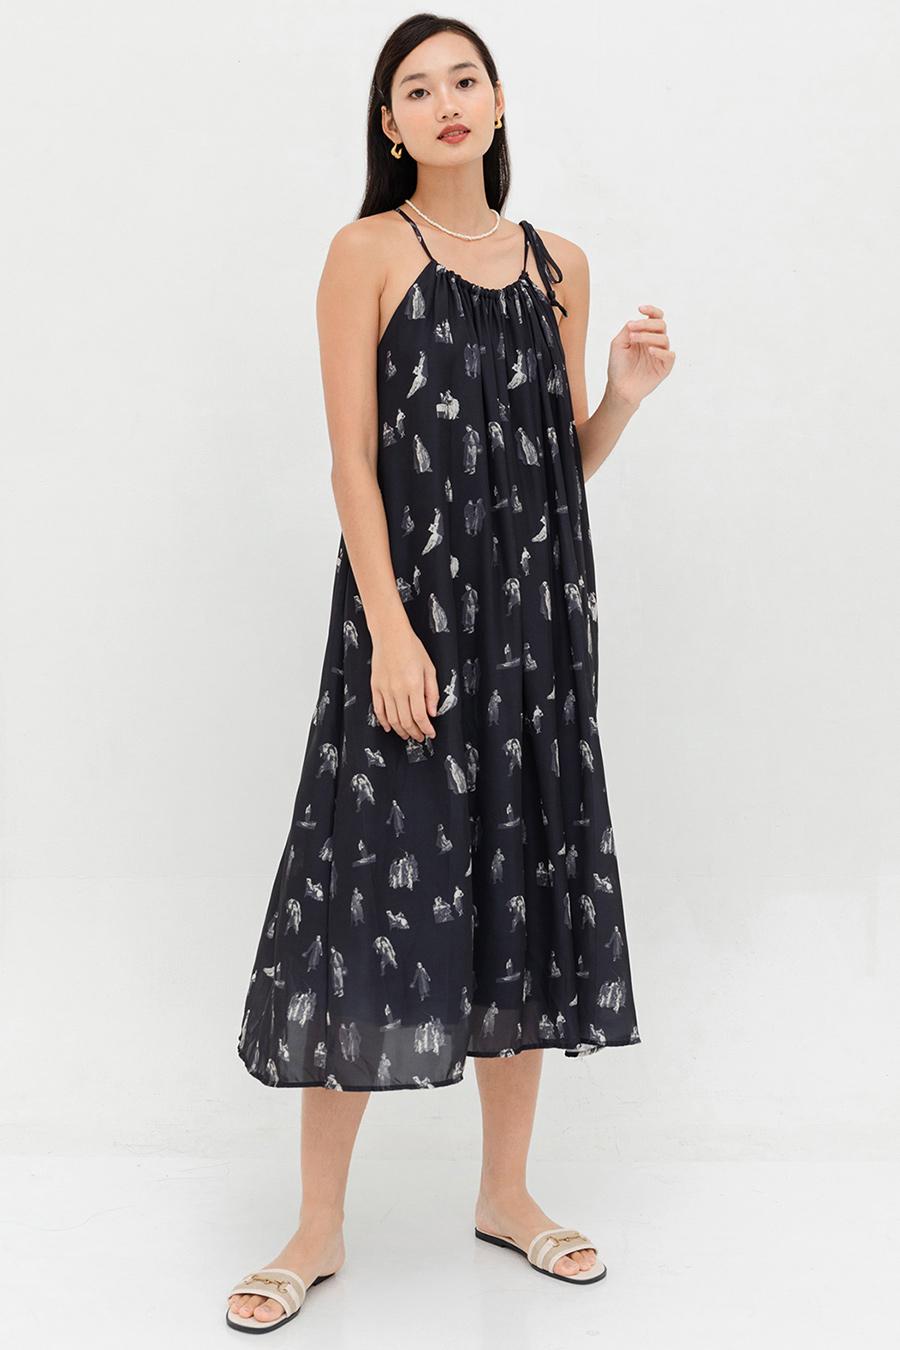 EDITH DRESS - NOIR